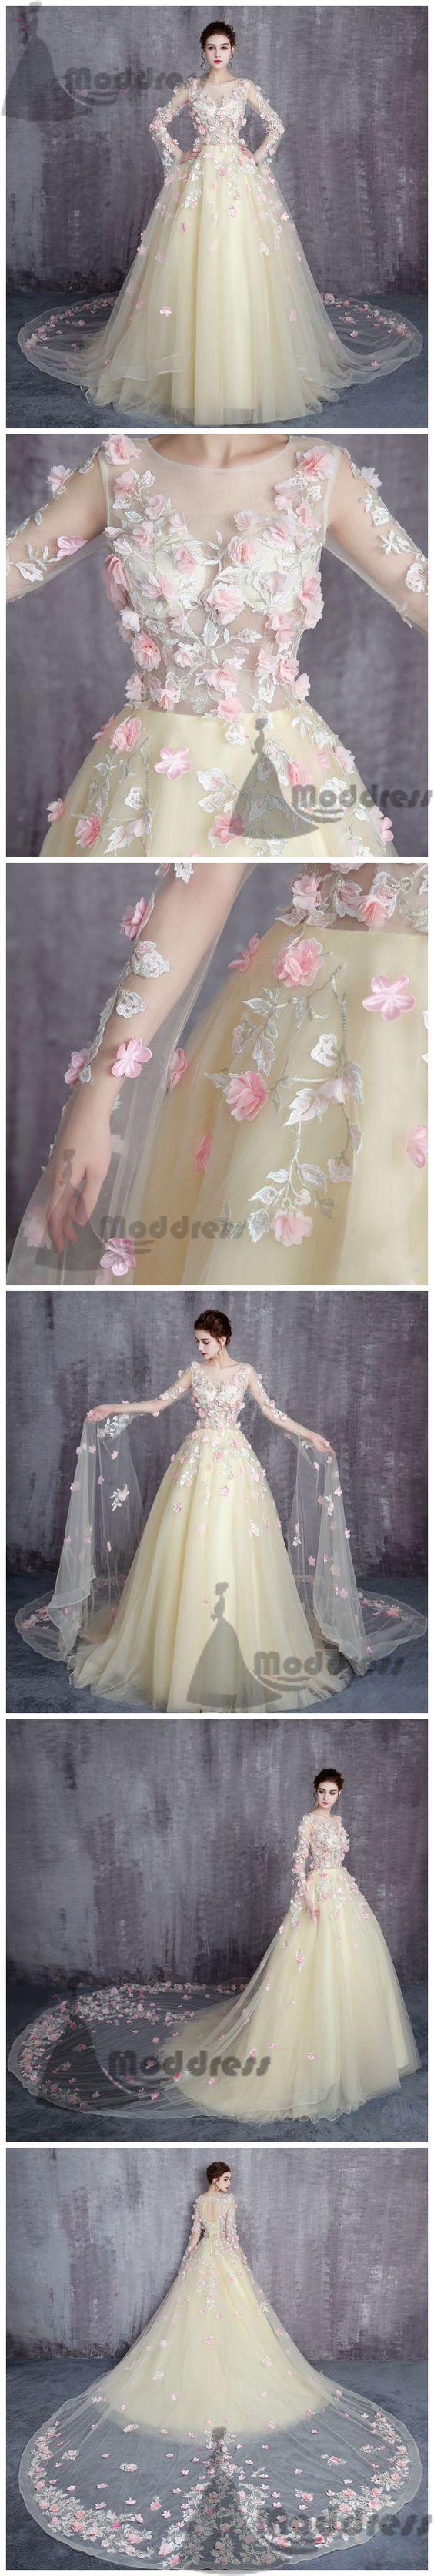 Elegant flowers wedding dress long sleeve tulle long prom dress with